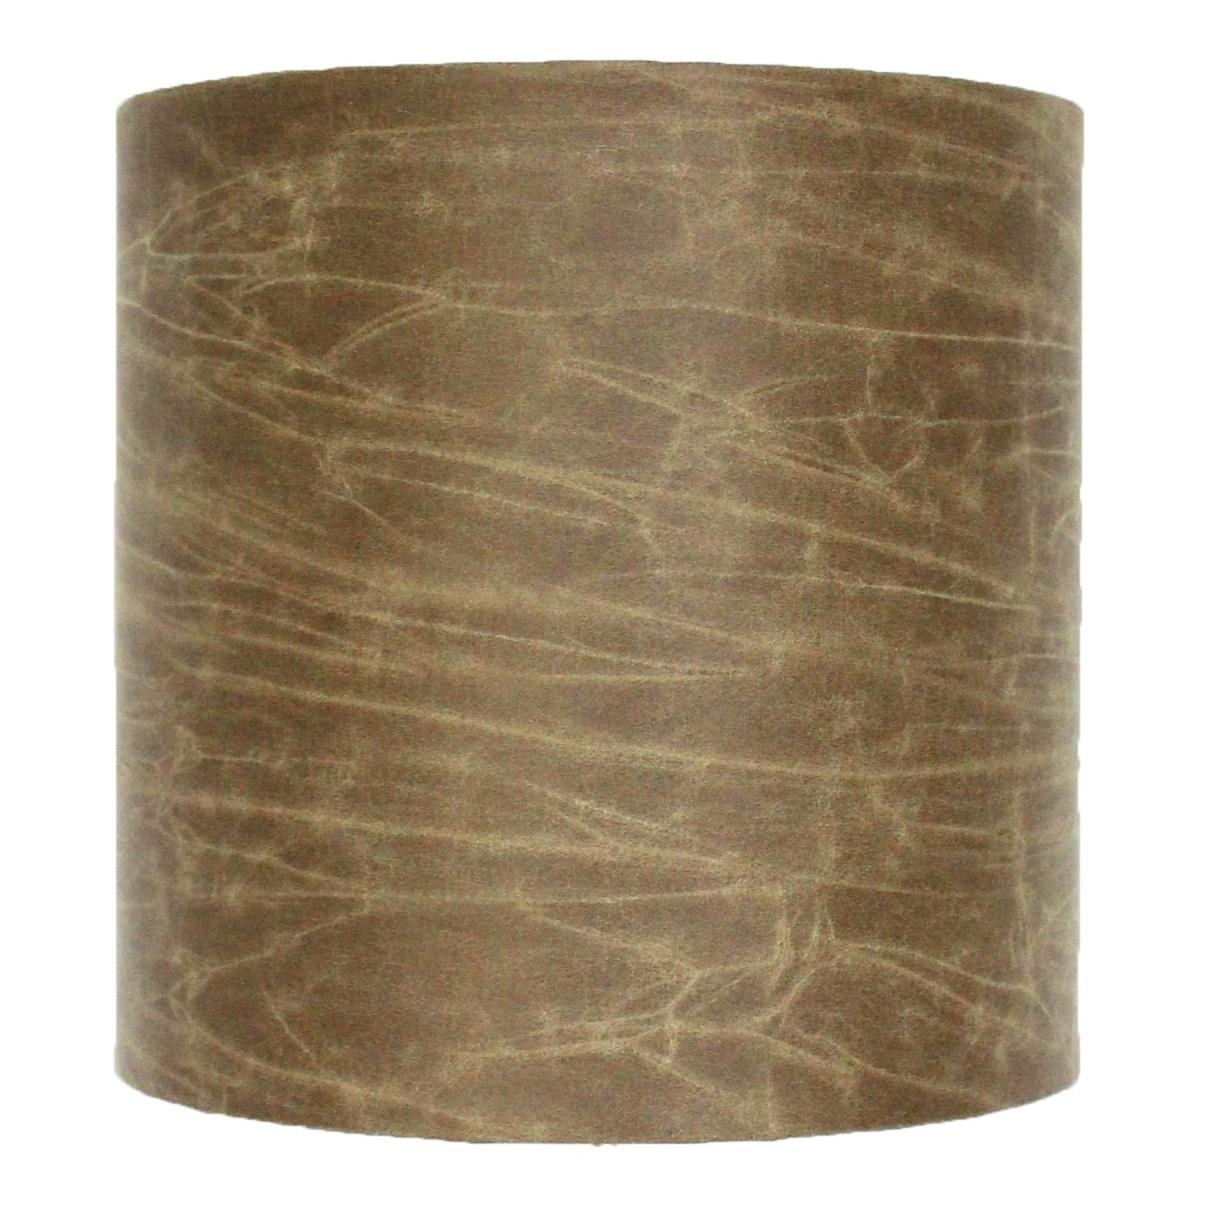 Lampenschirm S, Zylinder, Lederoptik, braun-grün